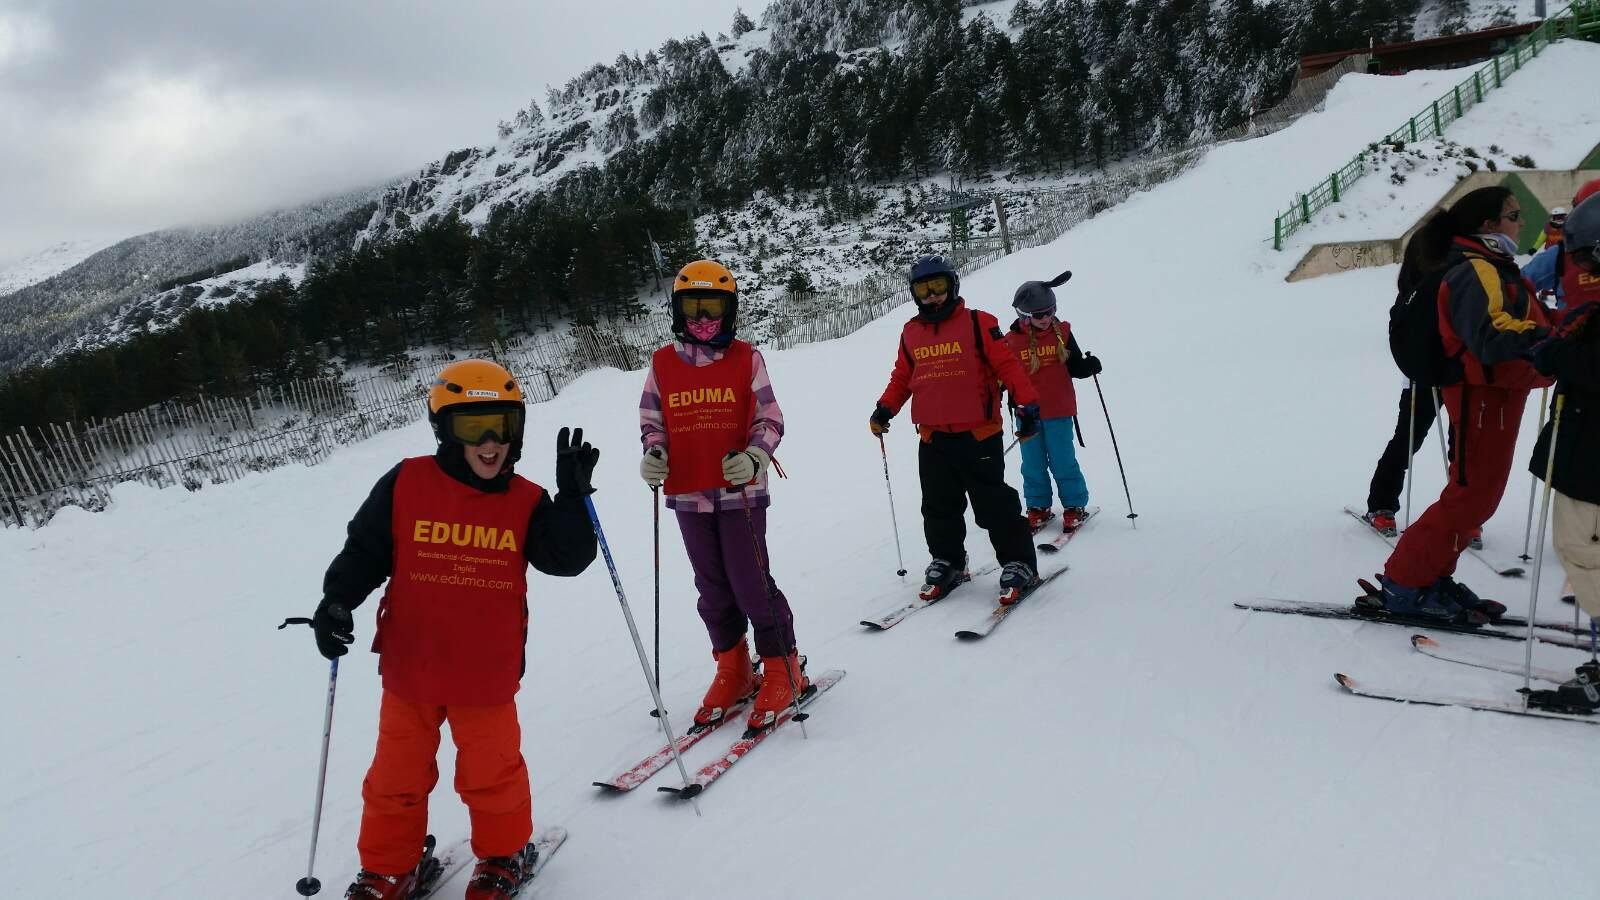 Vacaciones Escolares 2015. Curso de ski. Clases de esquí grupo a